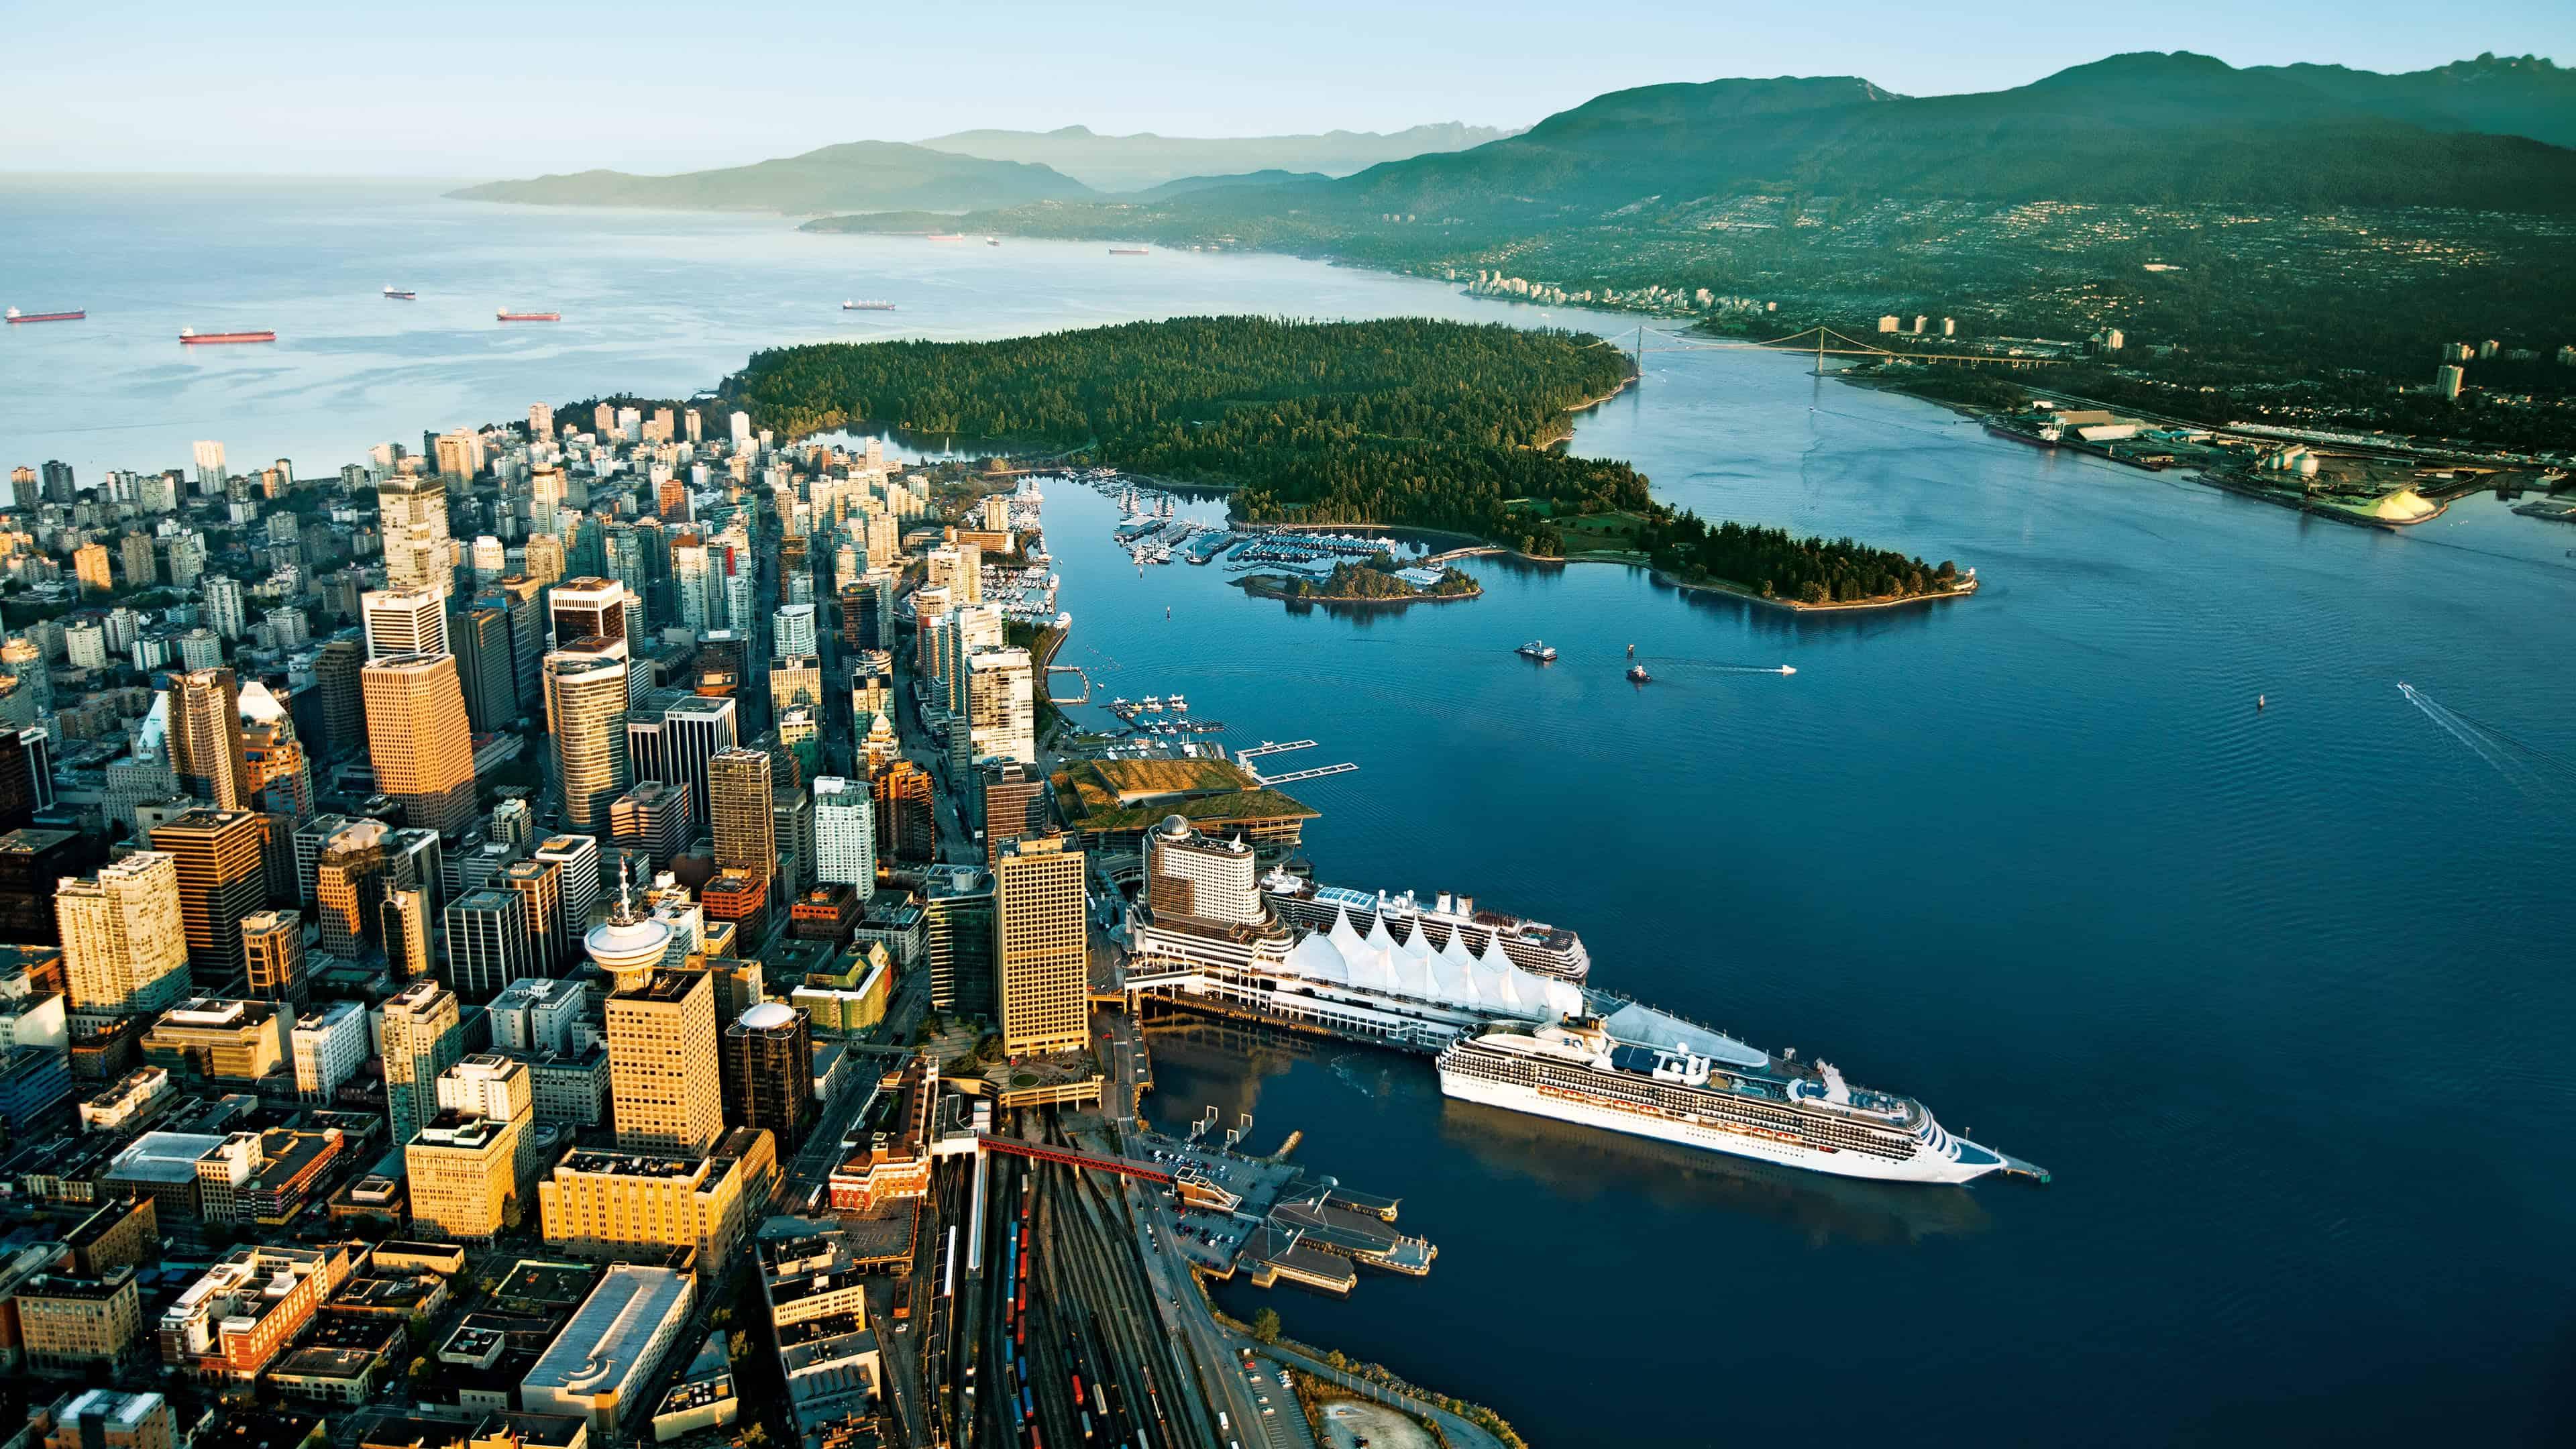 vancouver city canada aerial view uhd 4k wallpaper